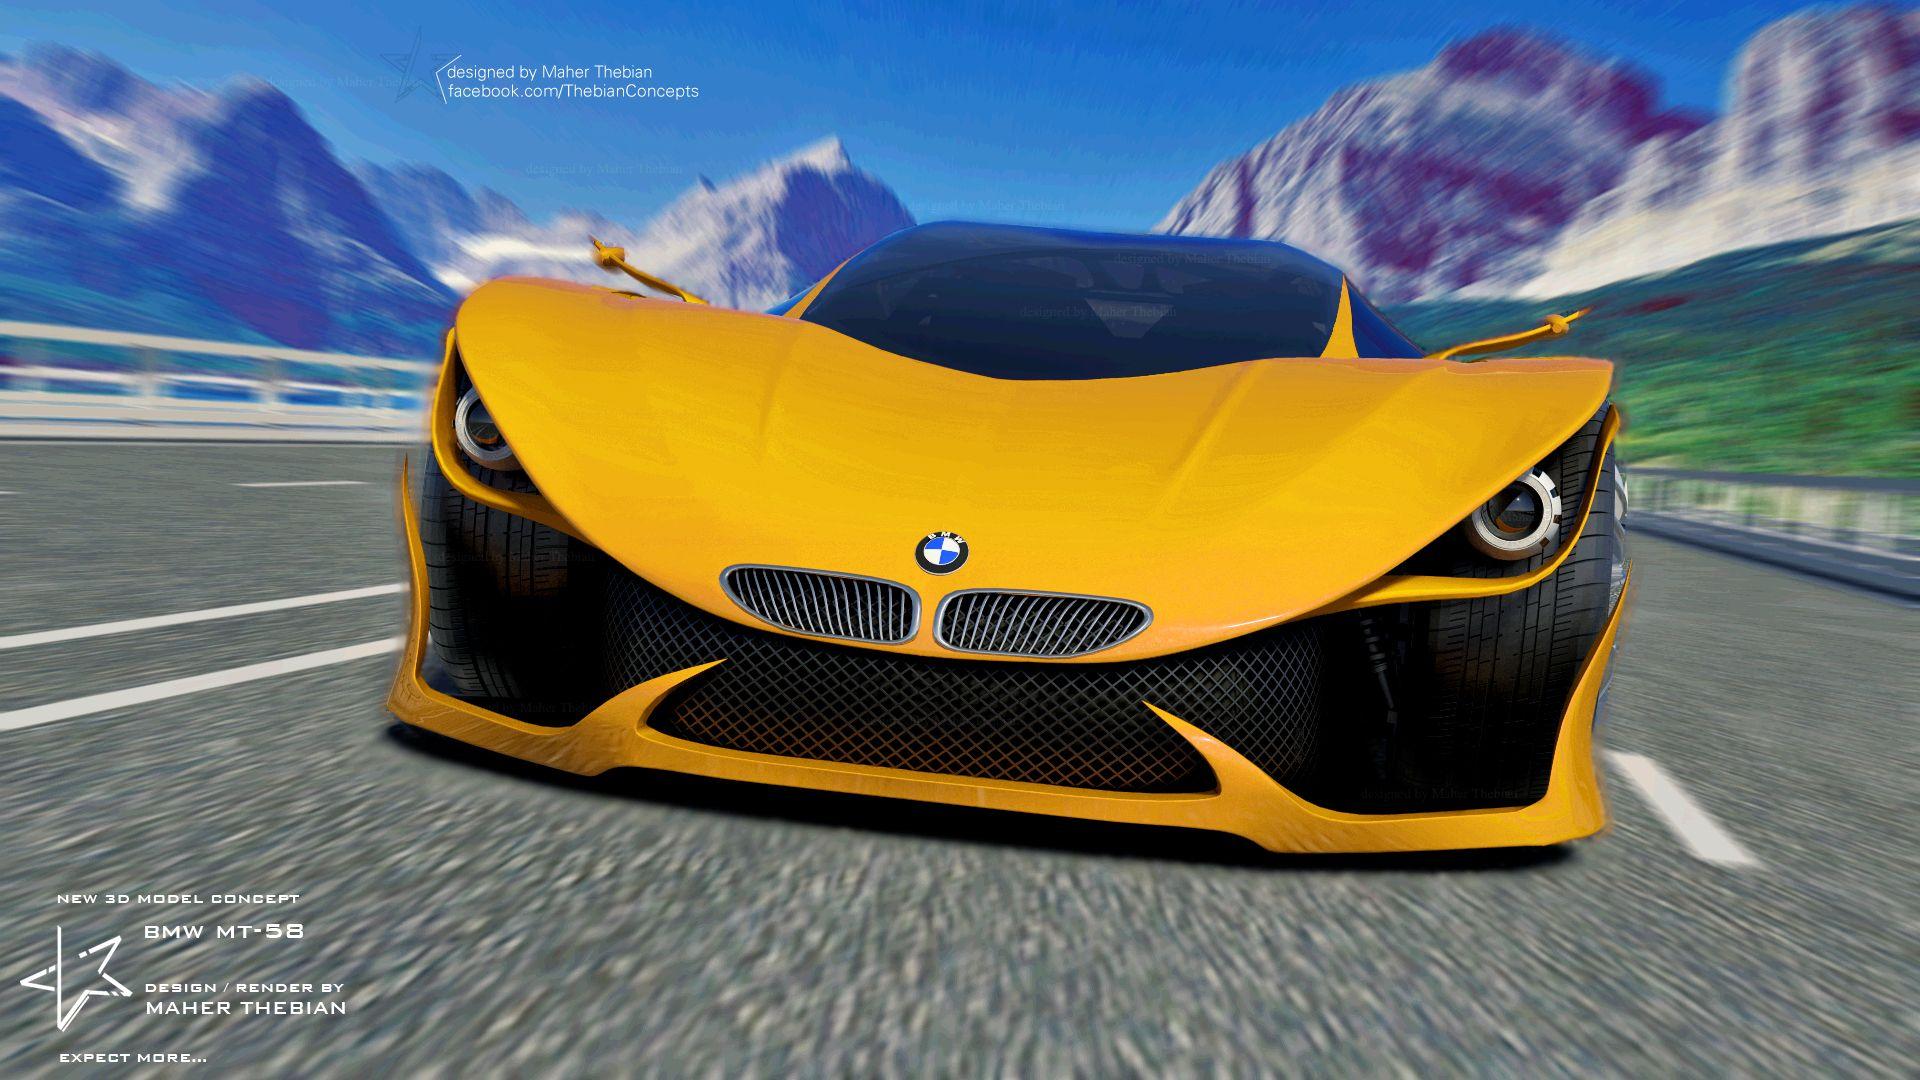 Thebian Concepts Bmw Sonic Car Bmw Concept Car